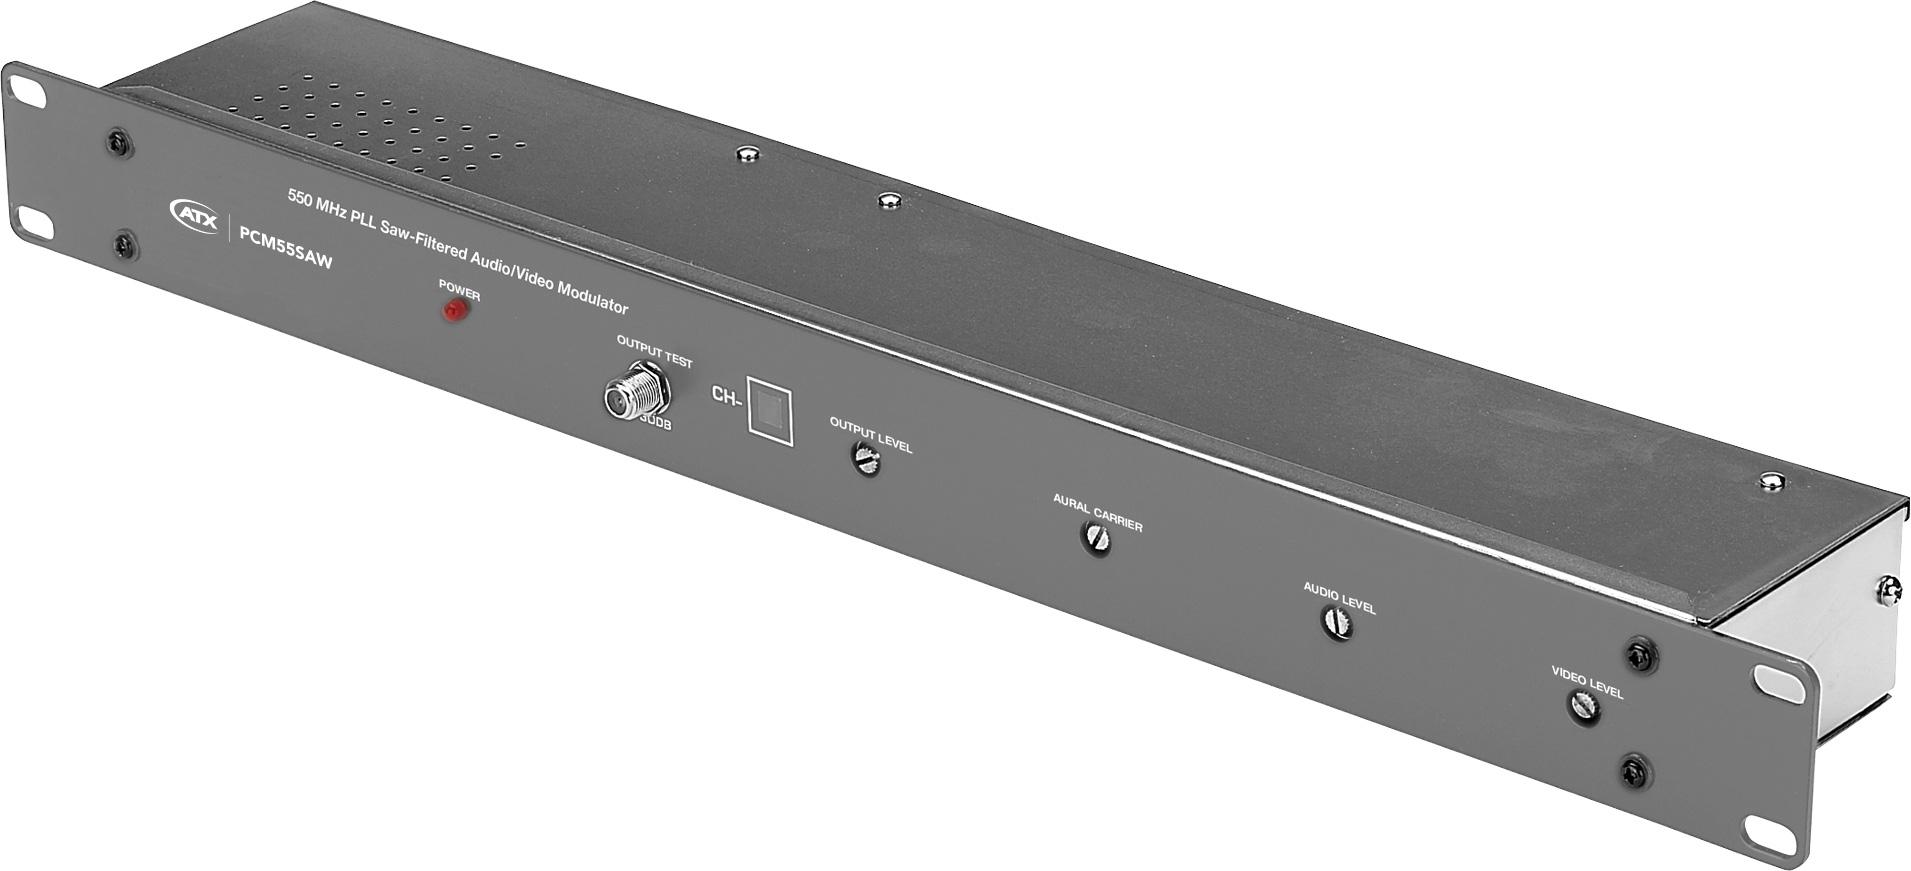 1 Channel Crystal A/V Modulator - Channel 12 PM-PCM55SAW-12